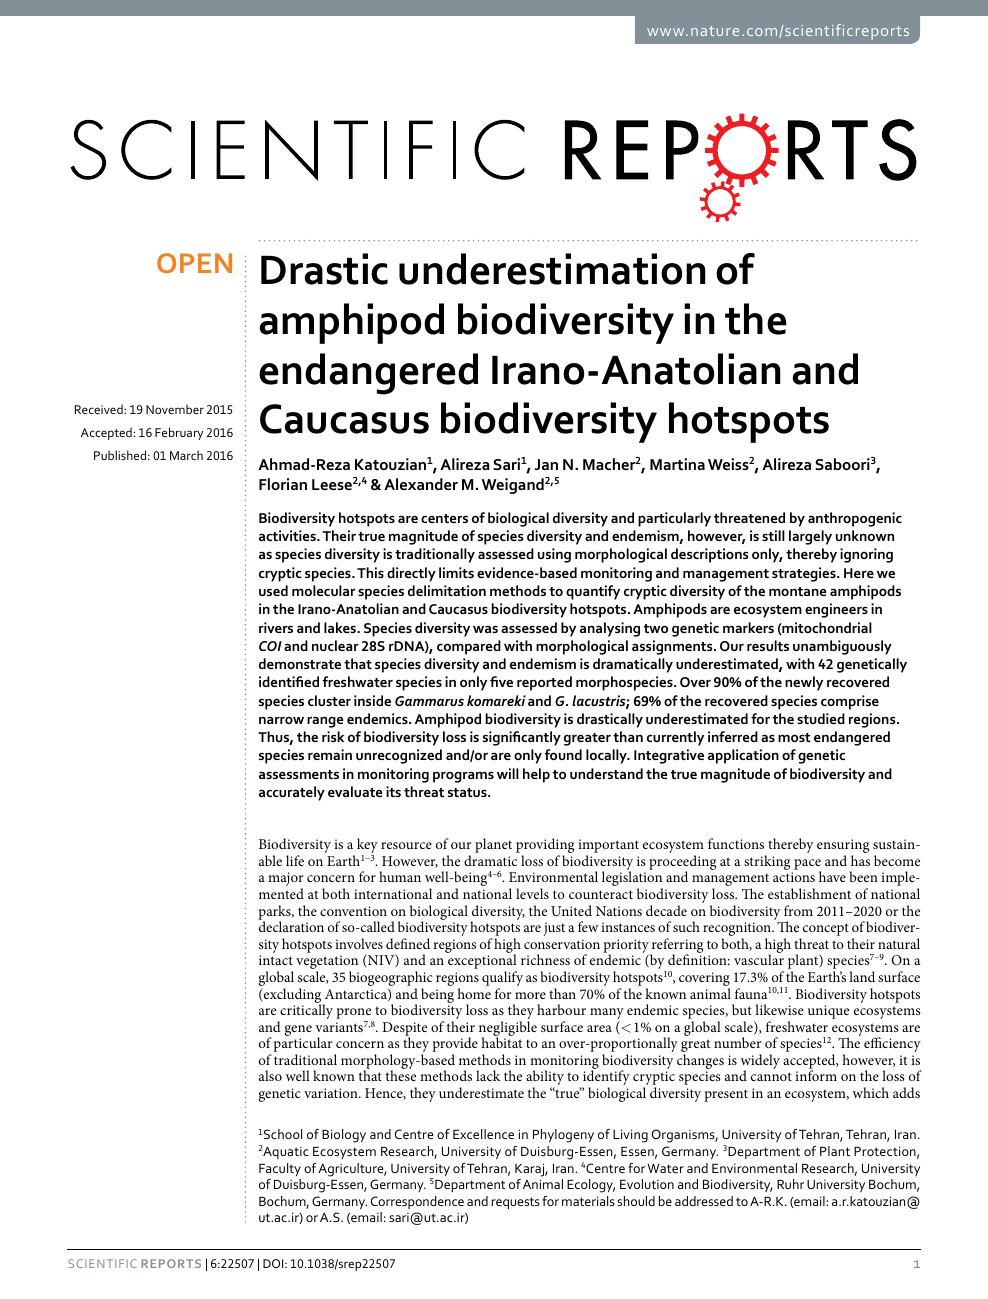 Drastic underestimation of amphipod biodiversity in the